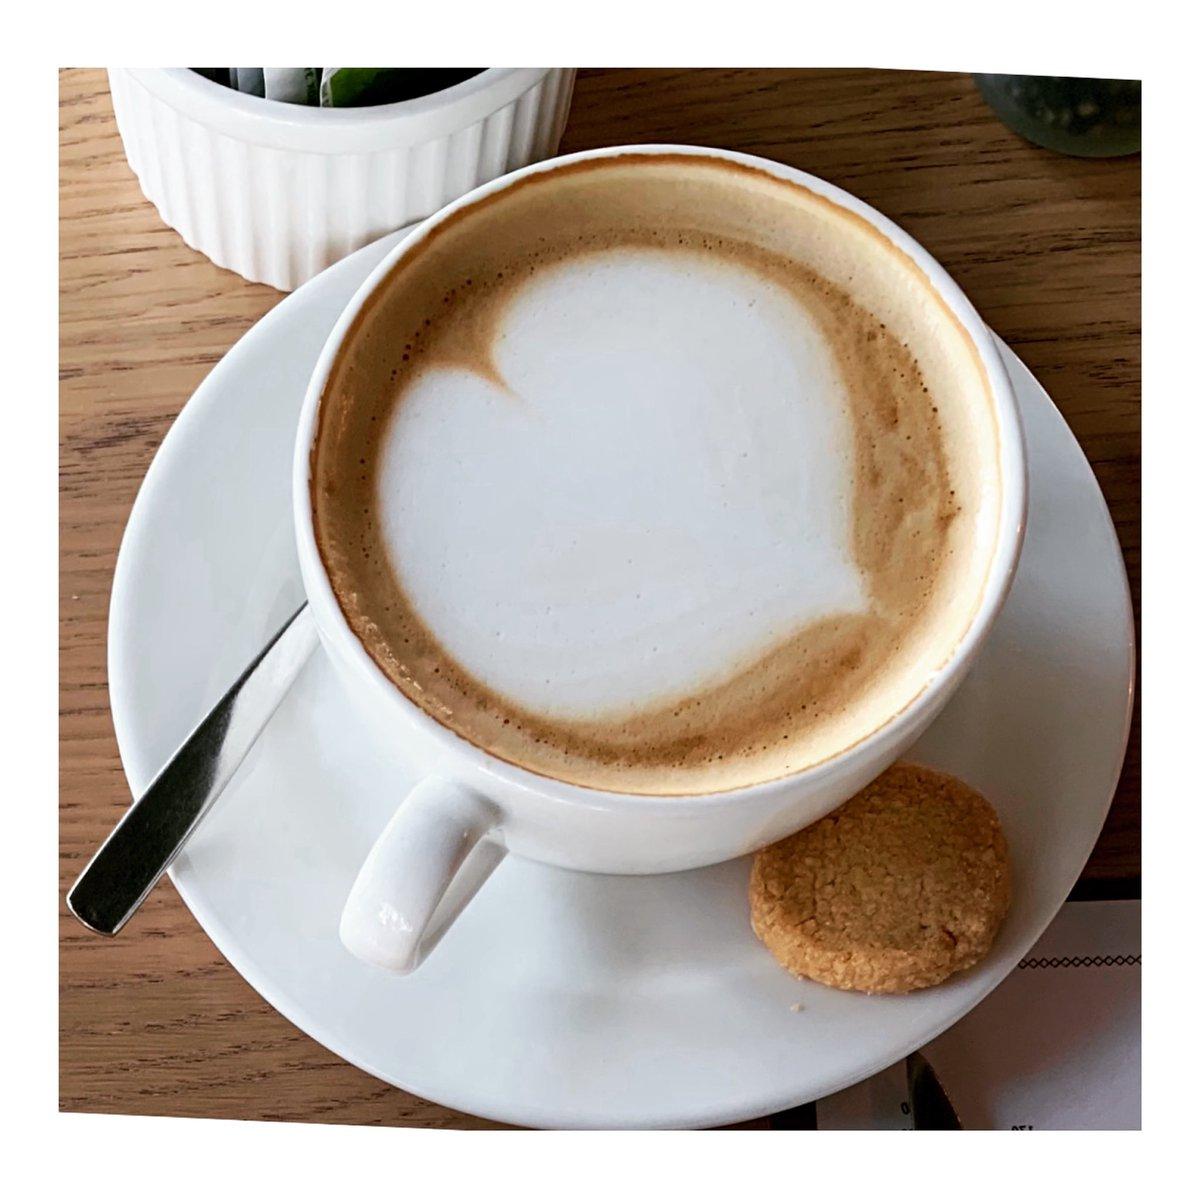 #goodmorning ☕️☕️☕️